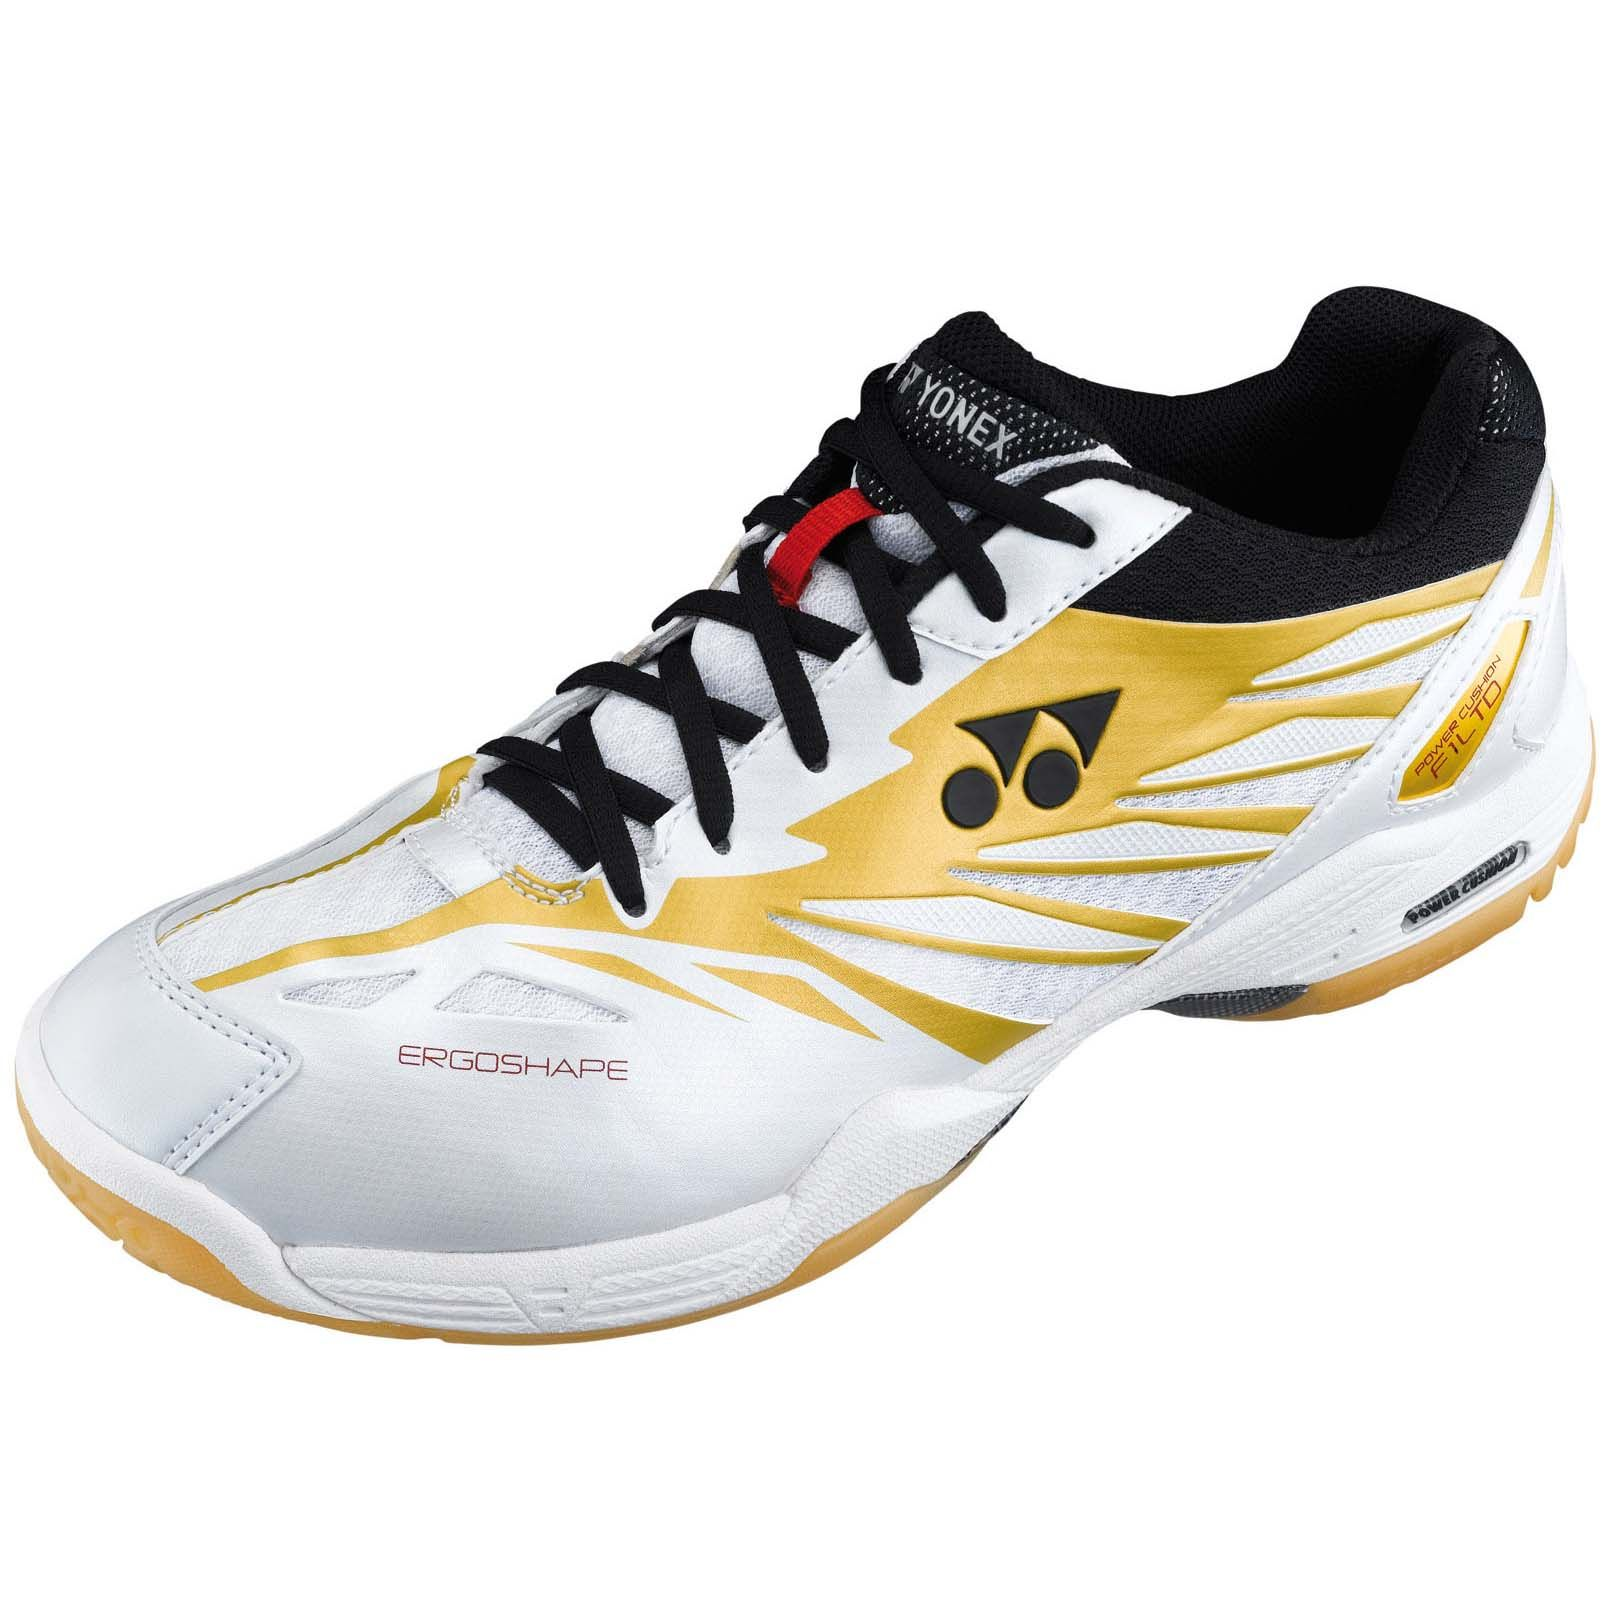 Badminton Shoes On Sale Philippines